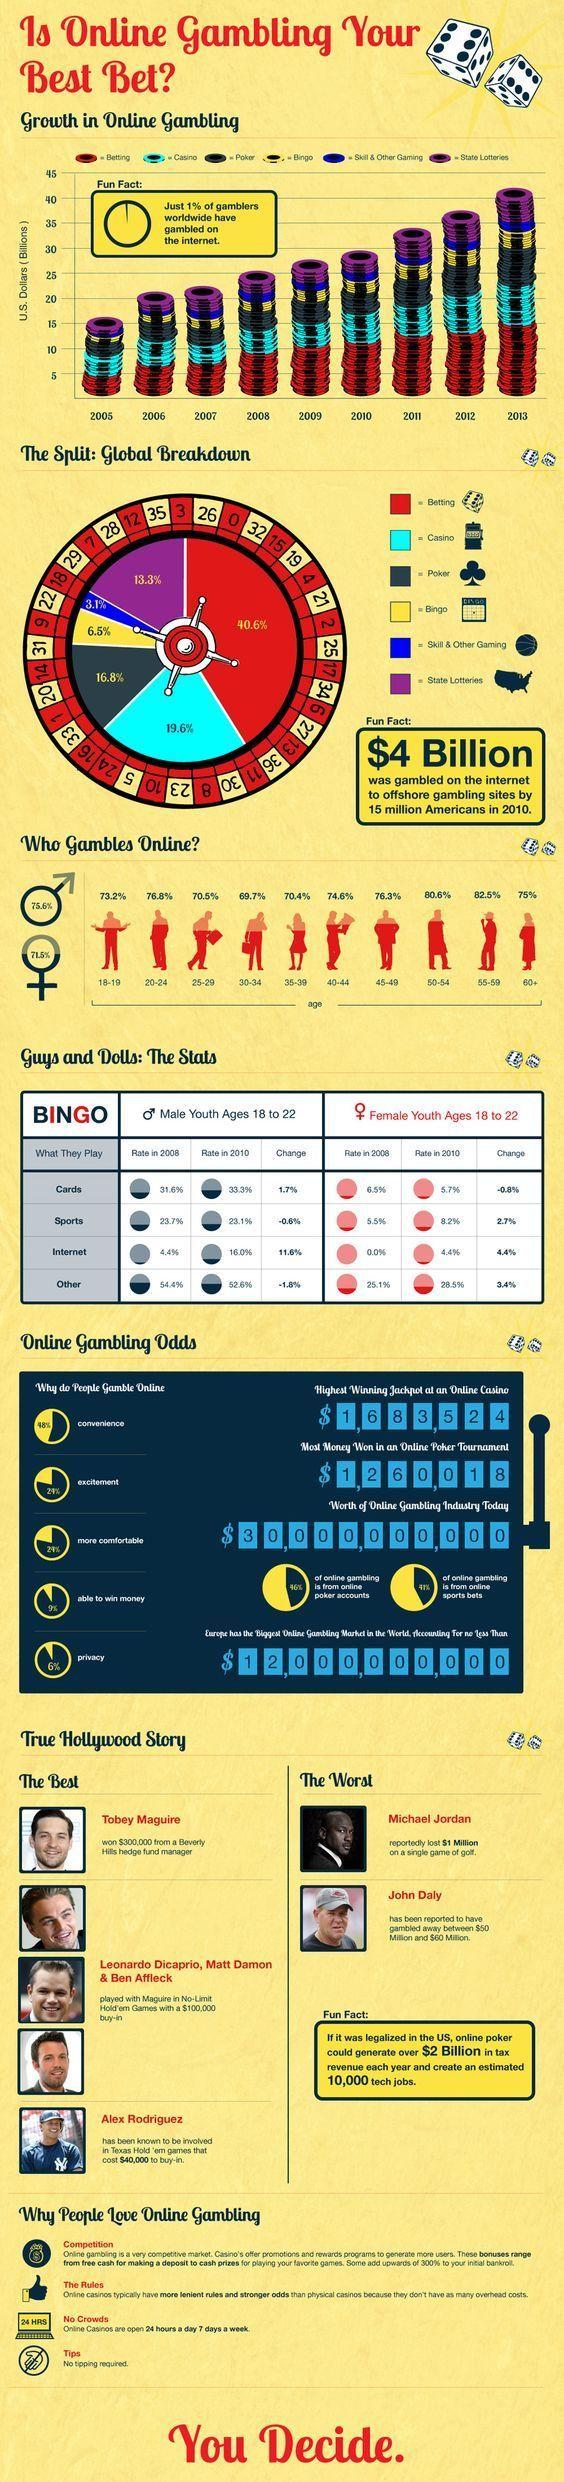 Why online gambling is good atlantic city casinos entertainment